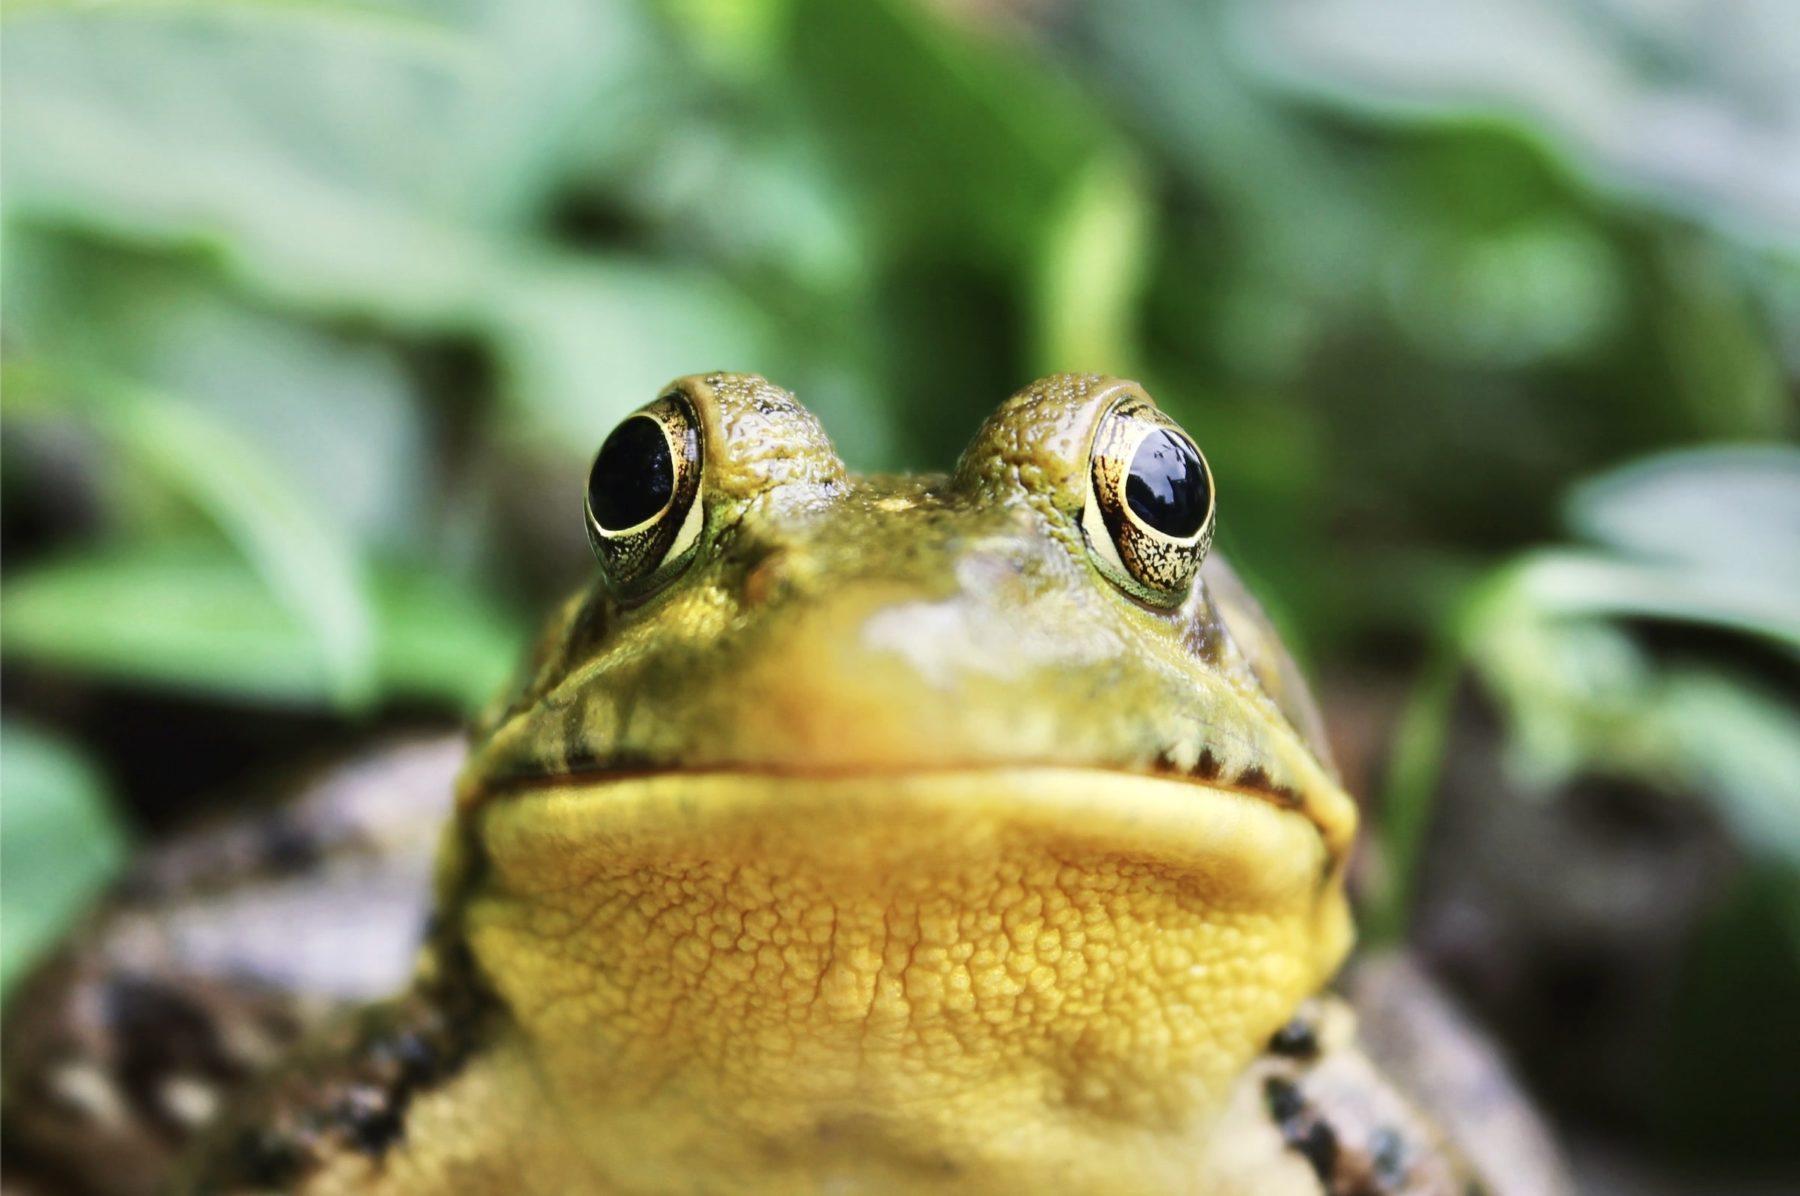 J'observe la biodiversité